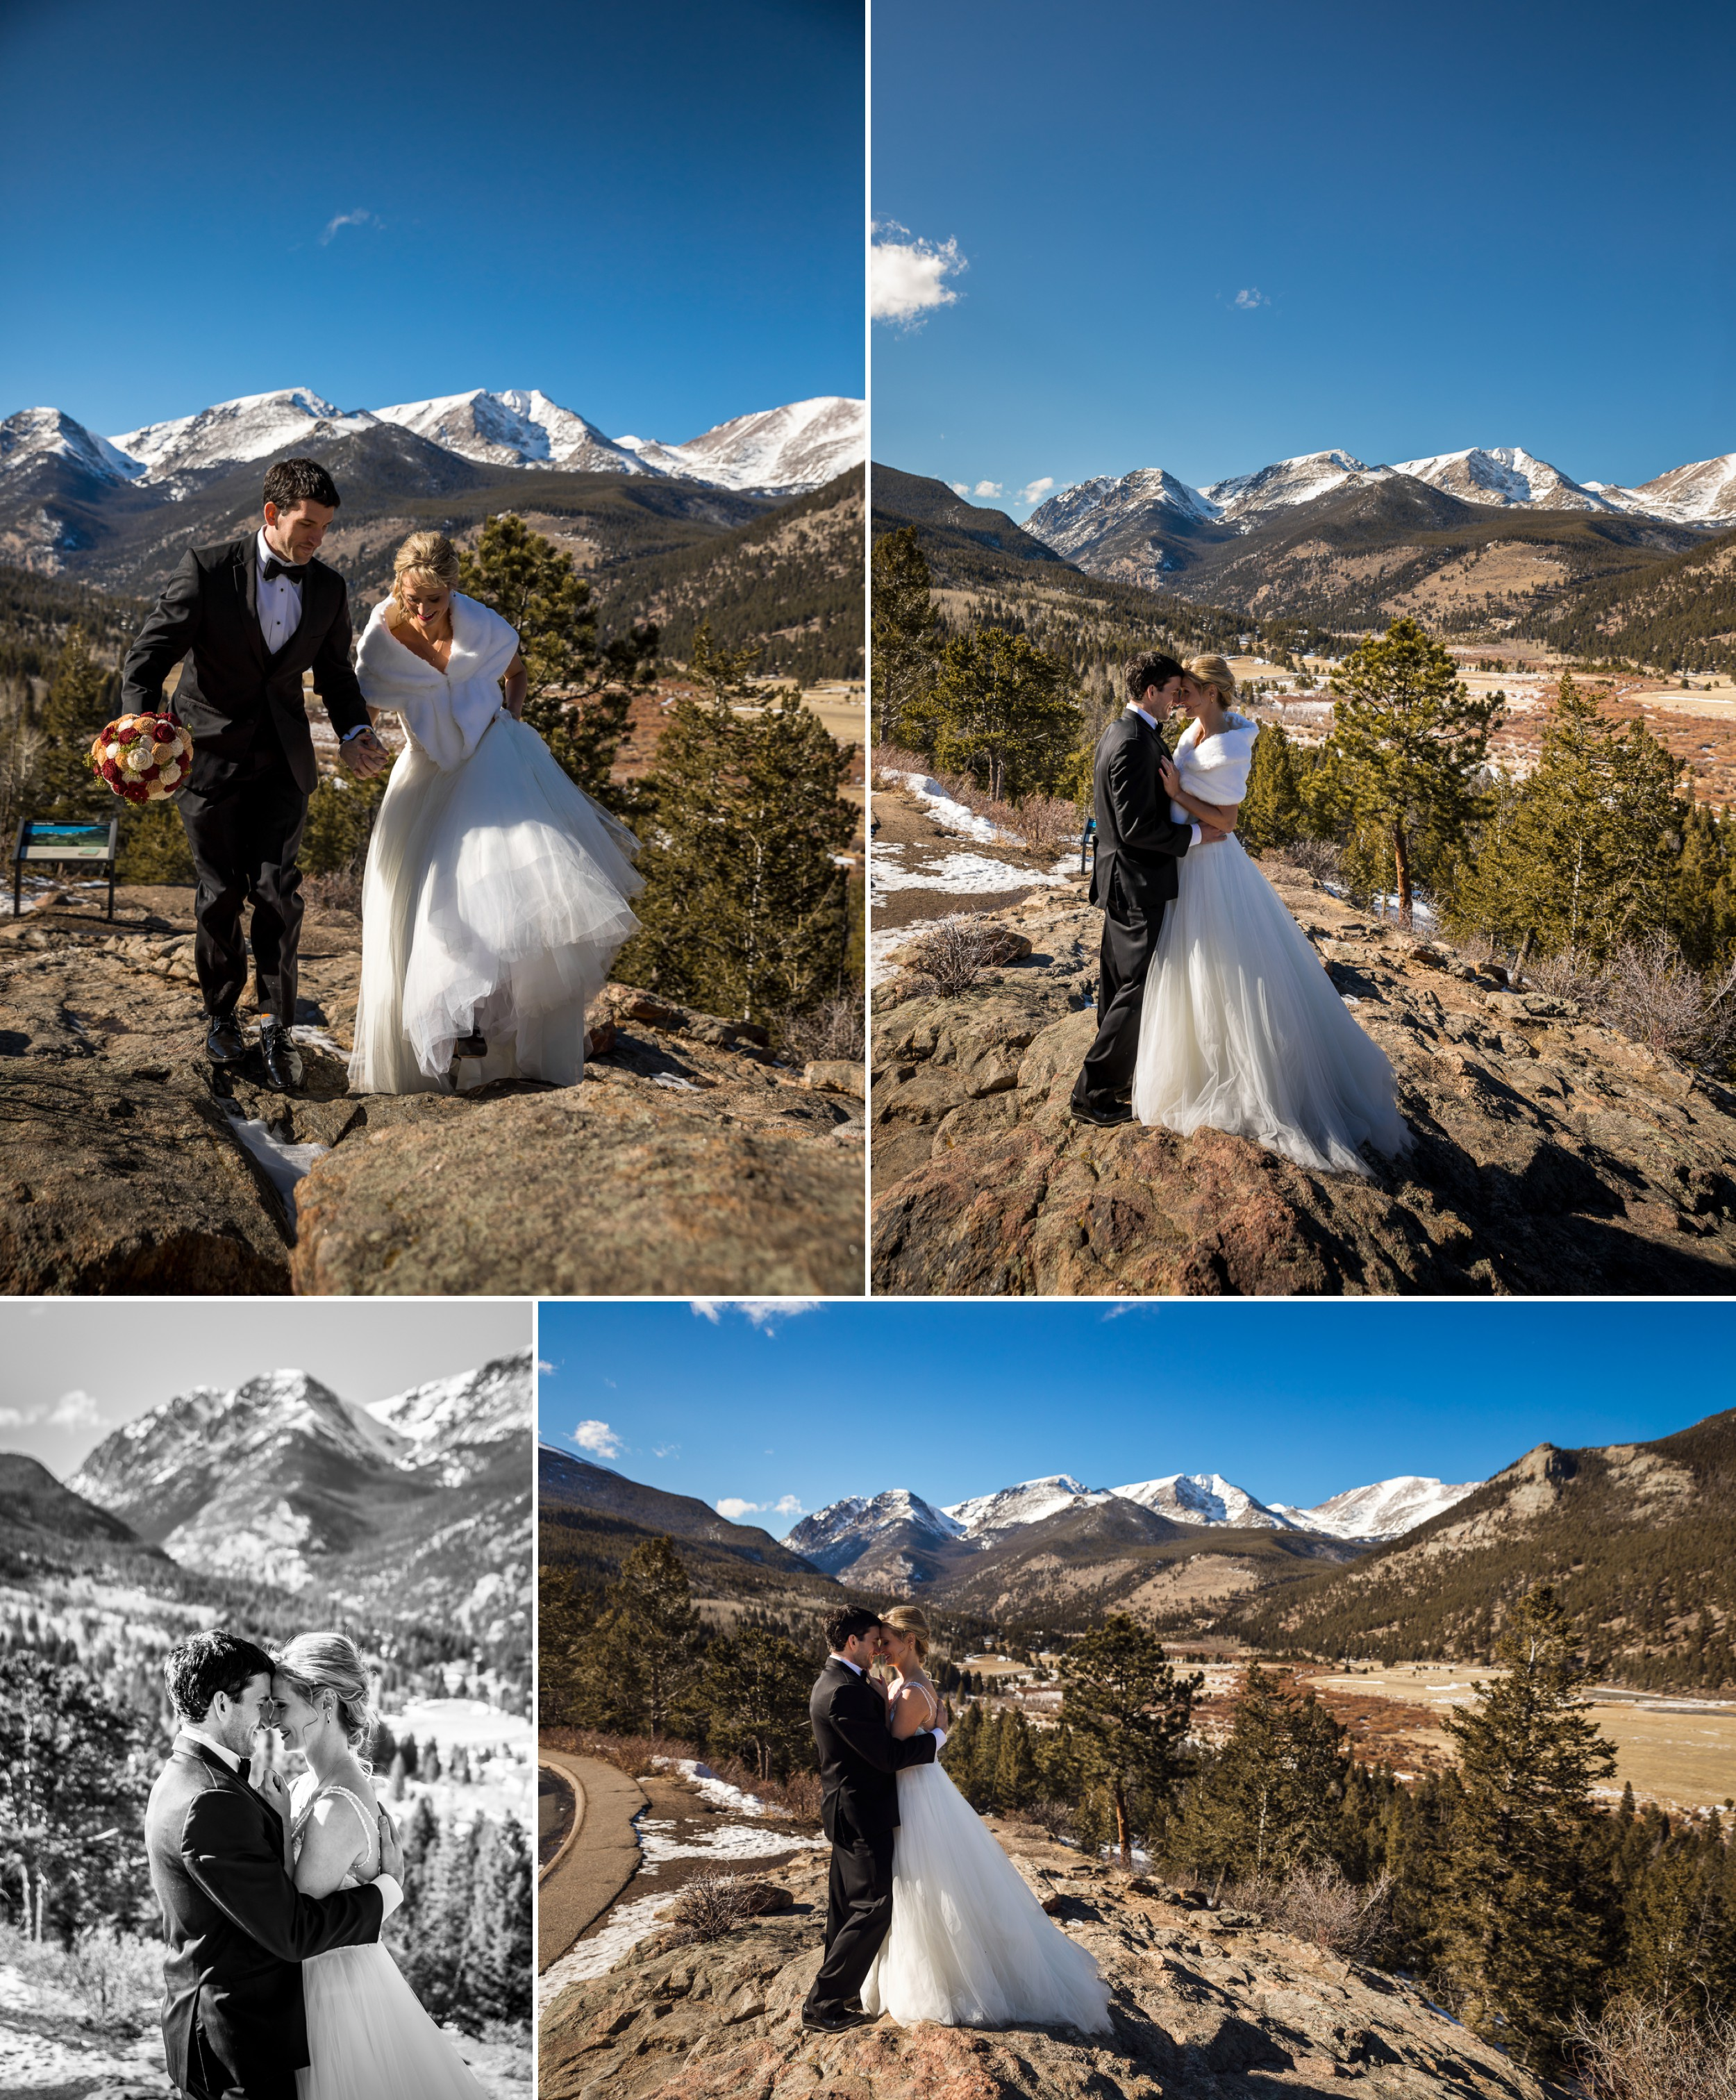 Della_Terra_Mountain_Chateau_Wedding_Photography 18.jpg